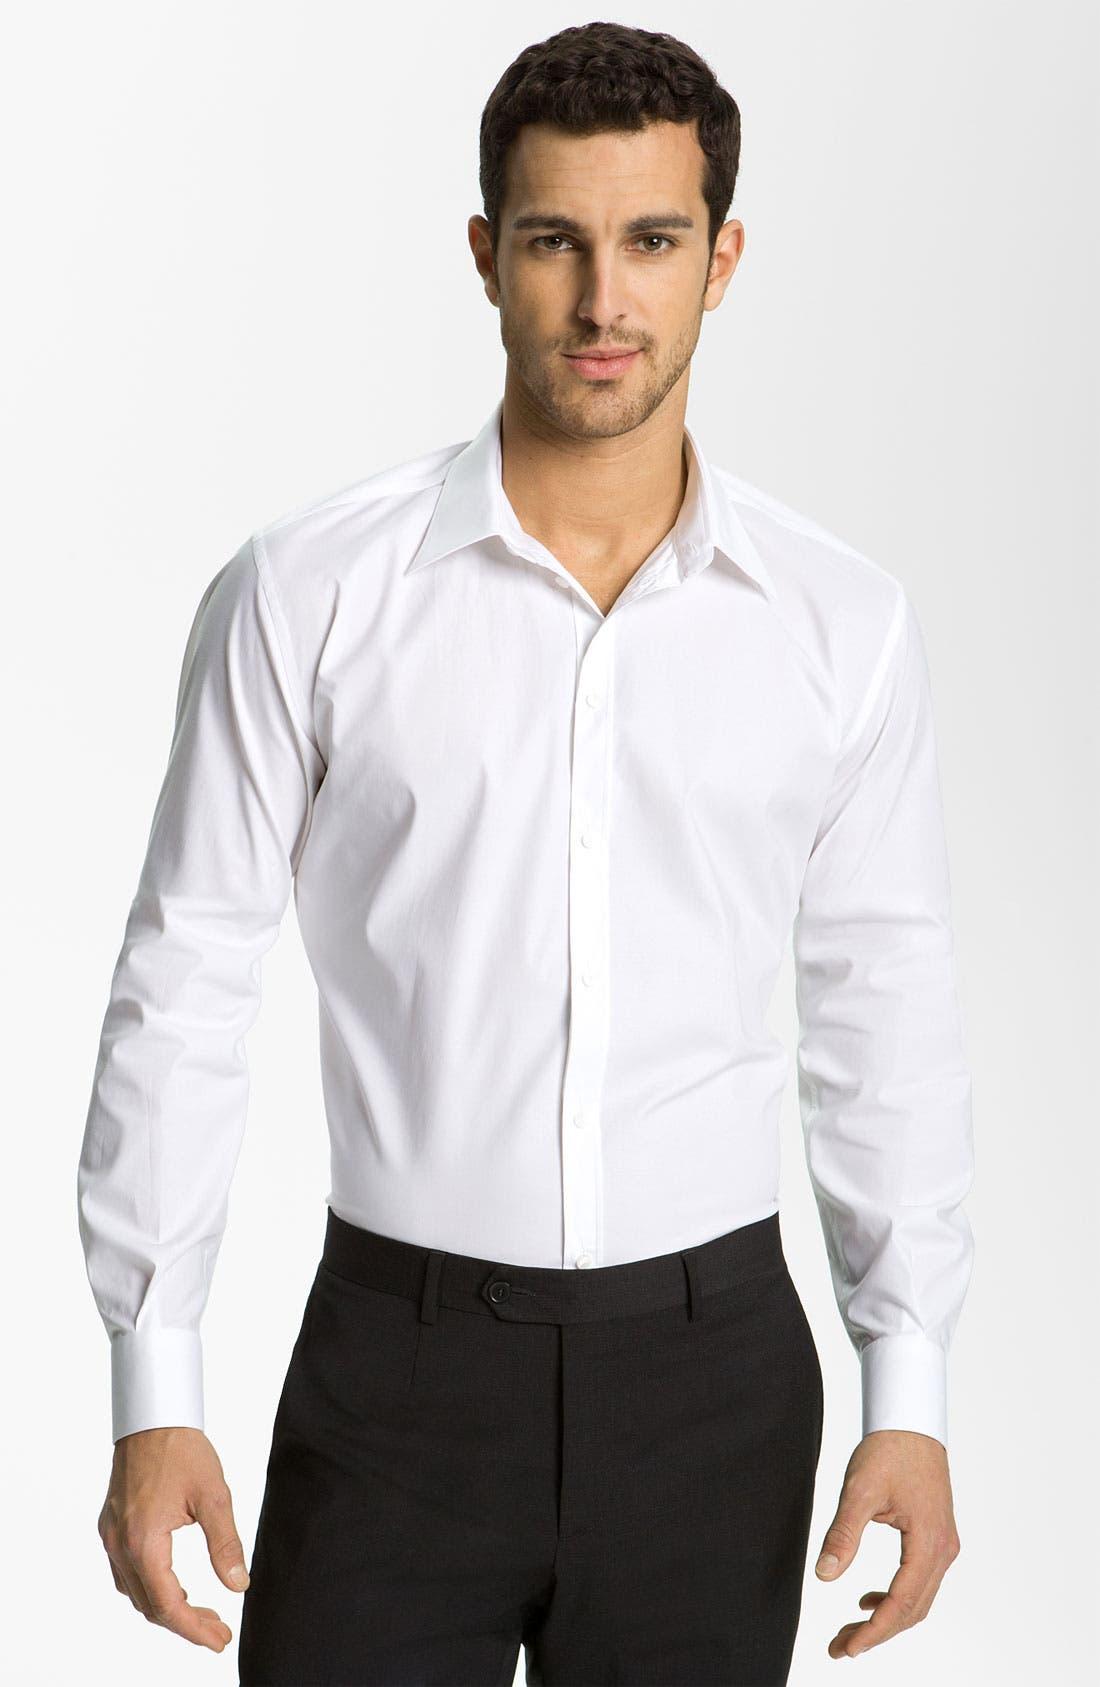 Alternate Image 1 Selected - Dolce&Gabbana 'Martini' Dress Shirt